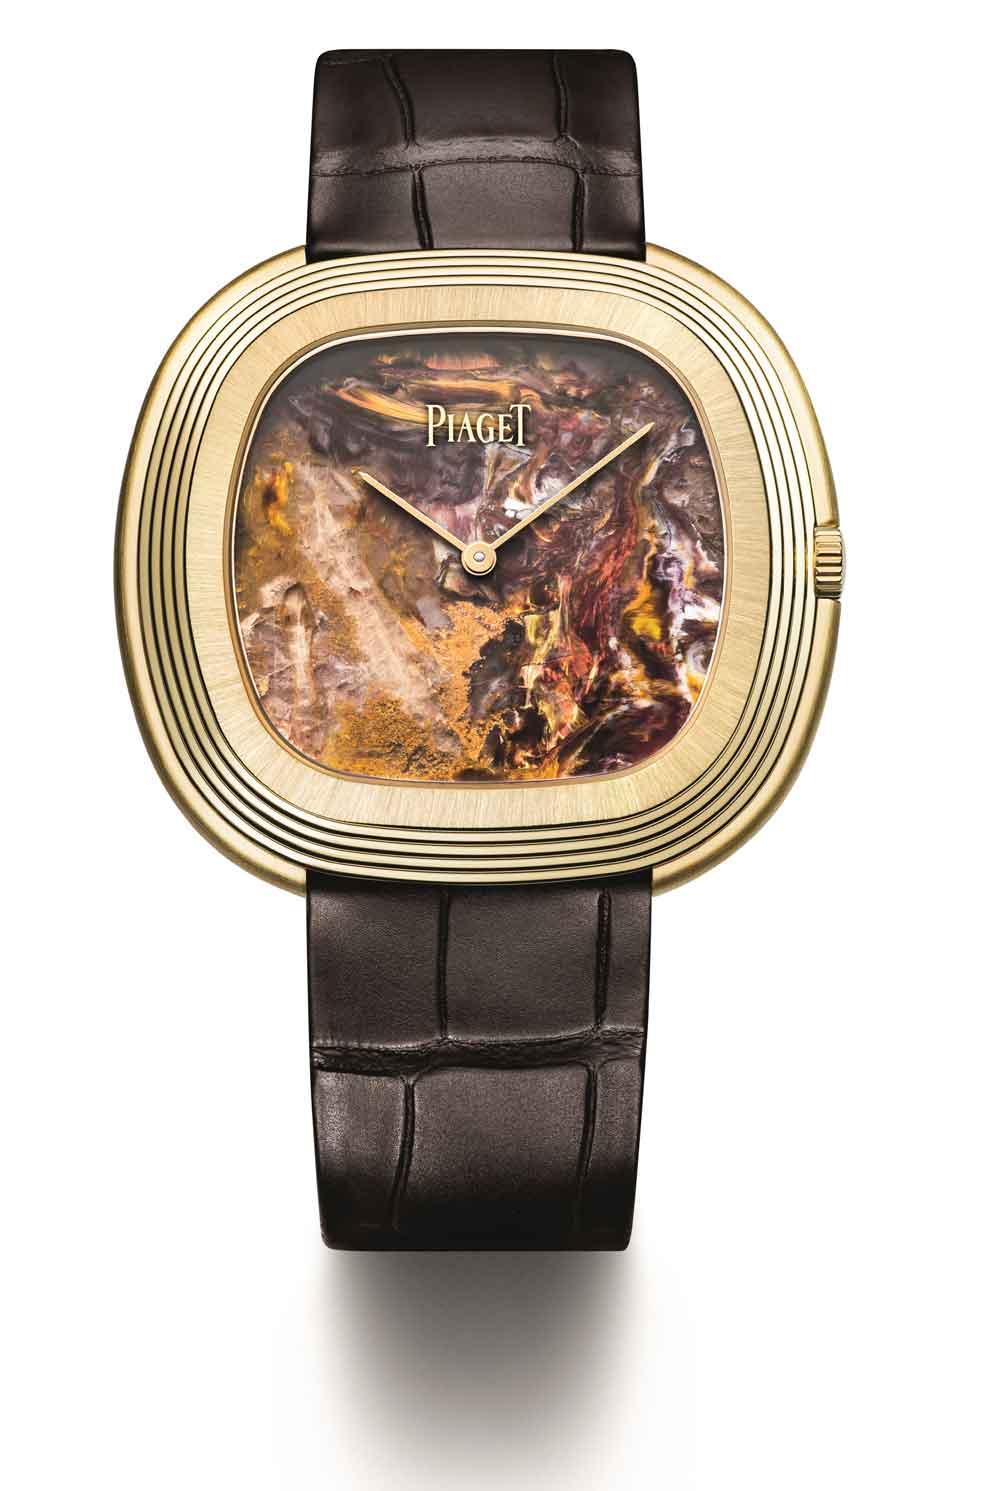 Reloj Piaget Black Tie Vintage Inspiration Only Watch